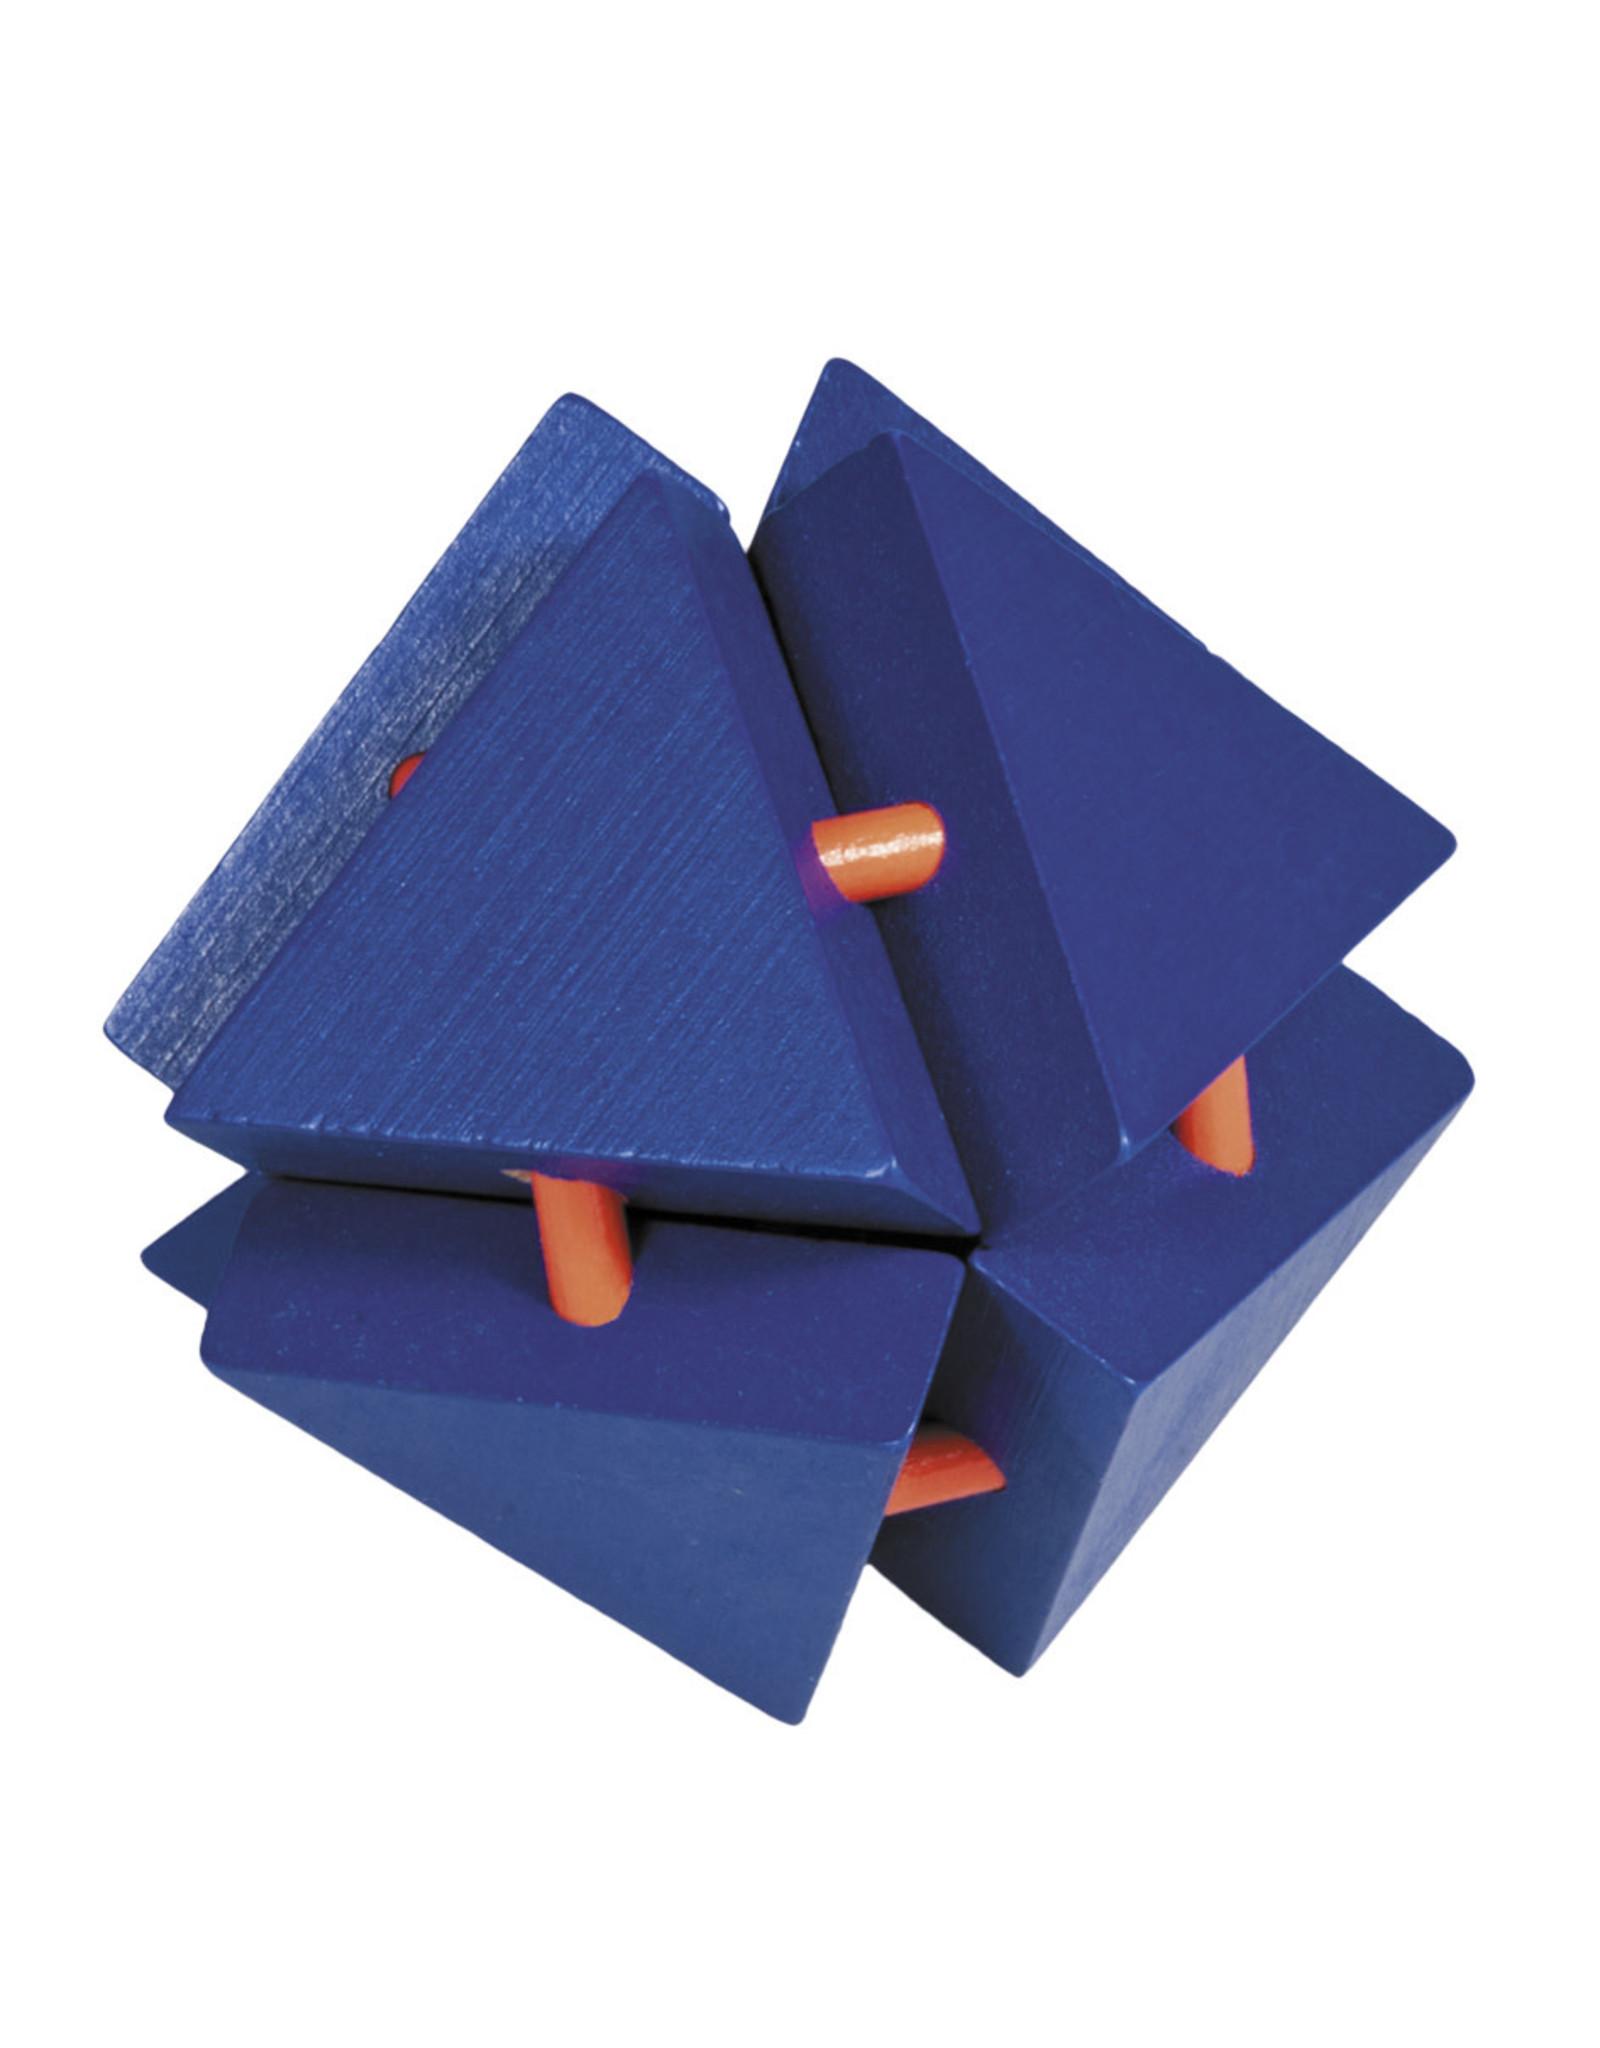 Fridolin IQ Test: Large Colorful Bamboo Puzzles